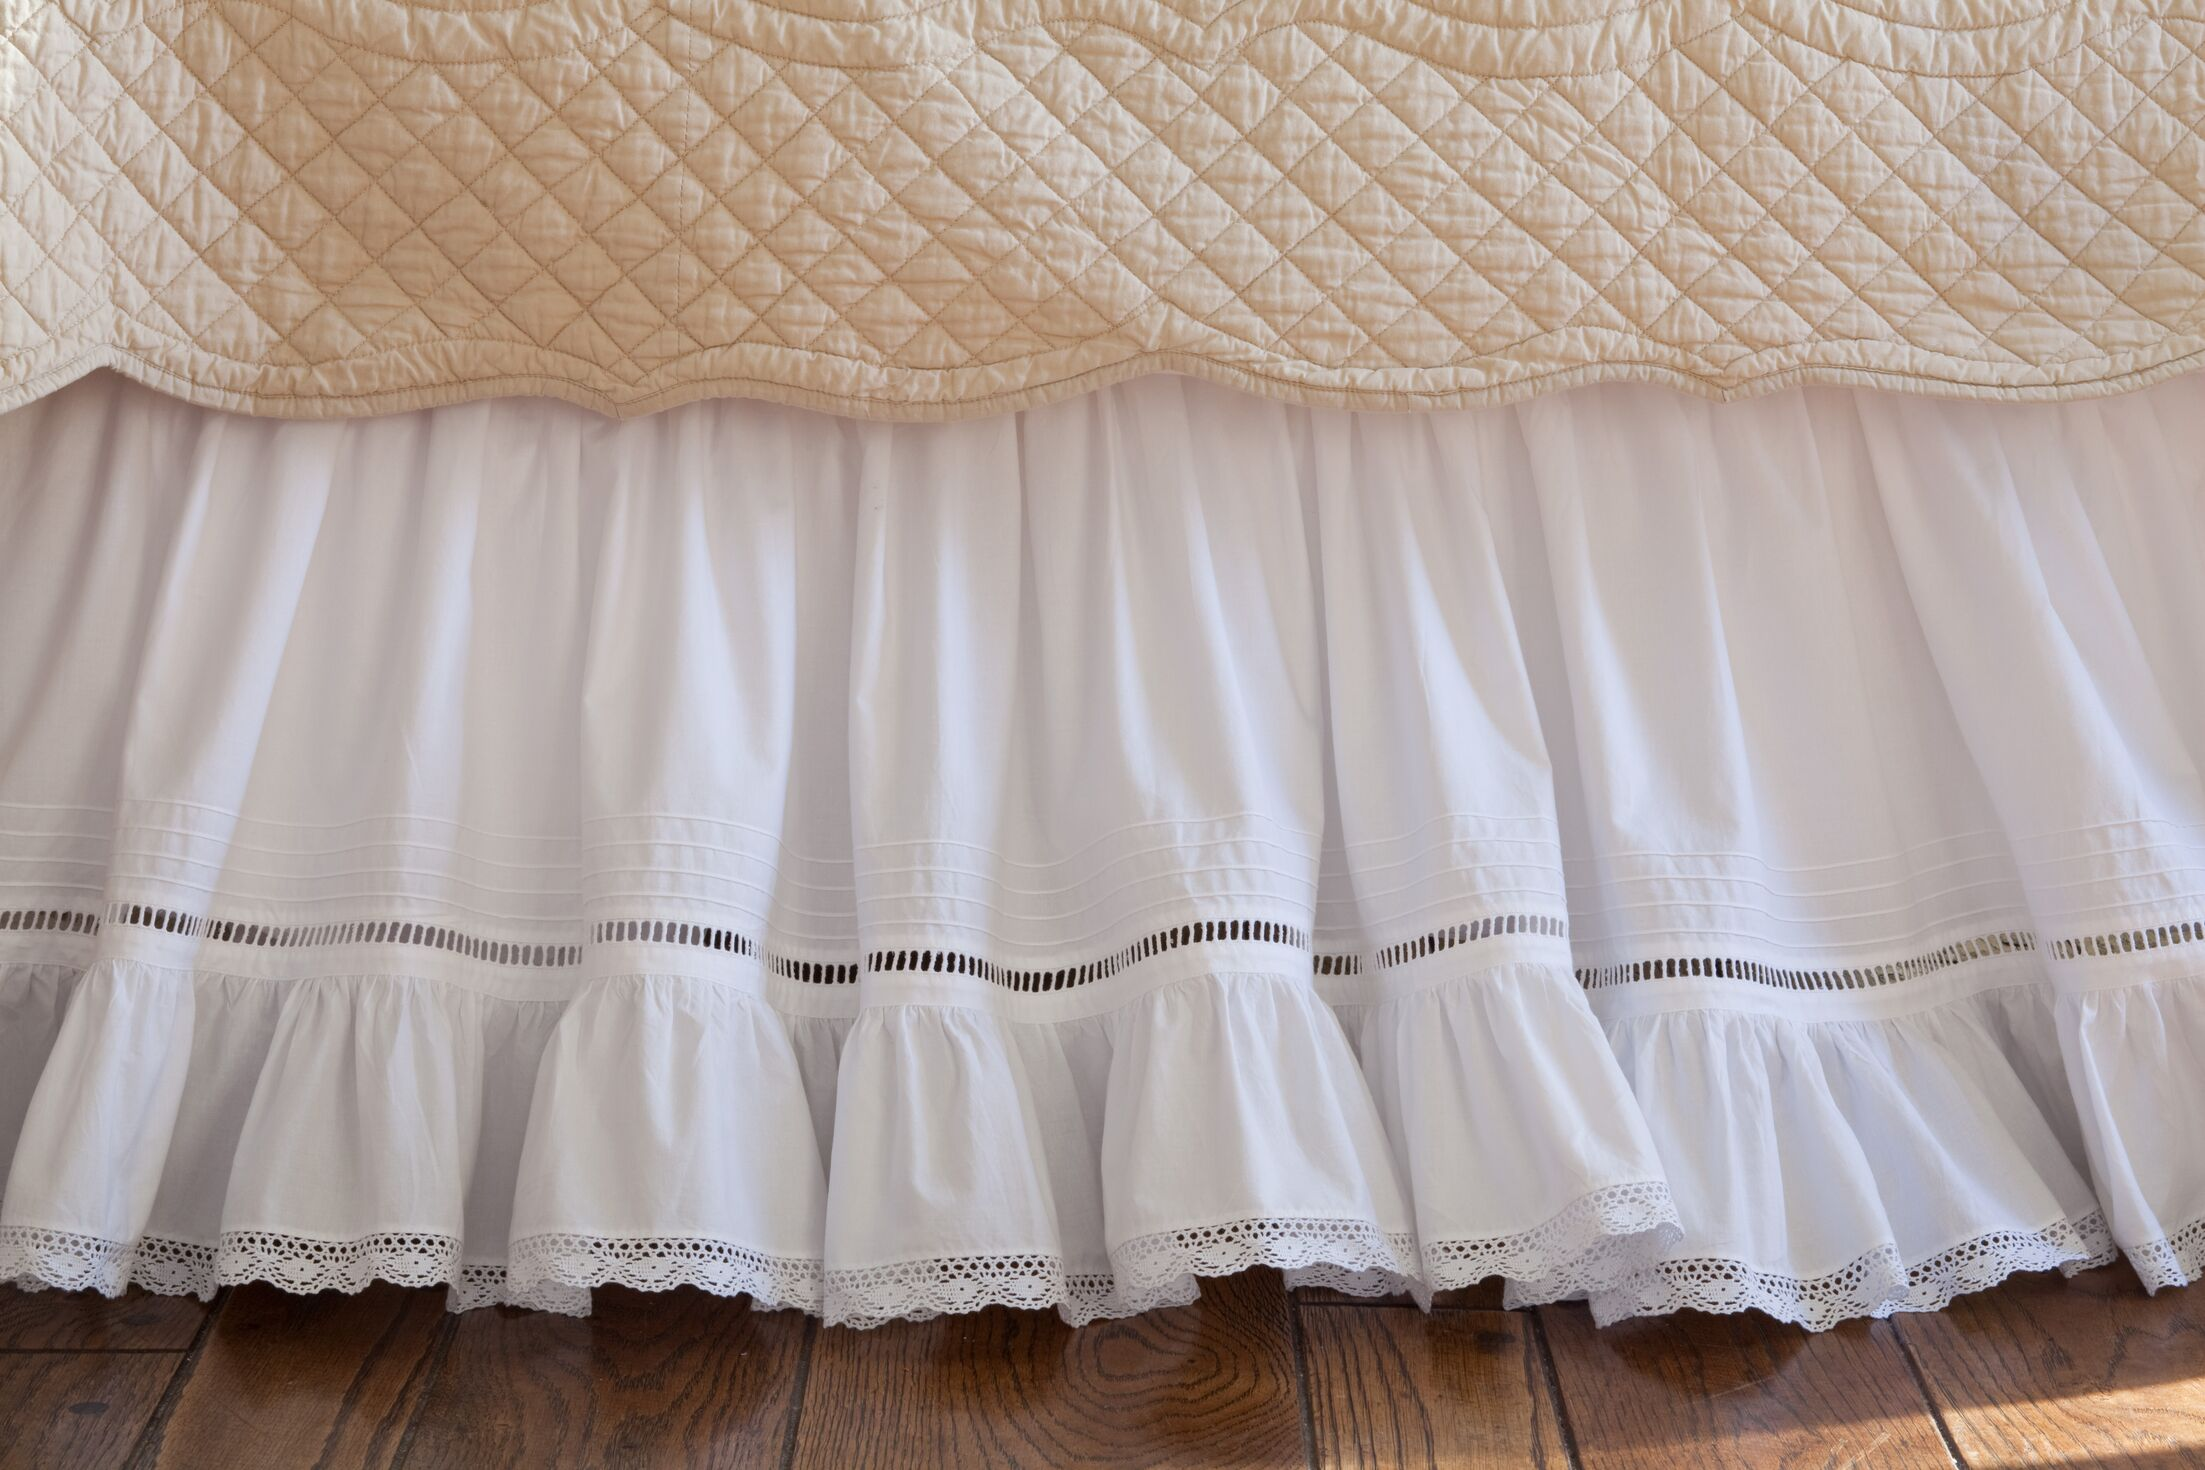 Prairie Crochet Cotton Bed Skirt Size: California King